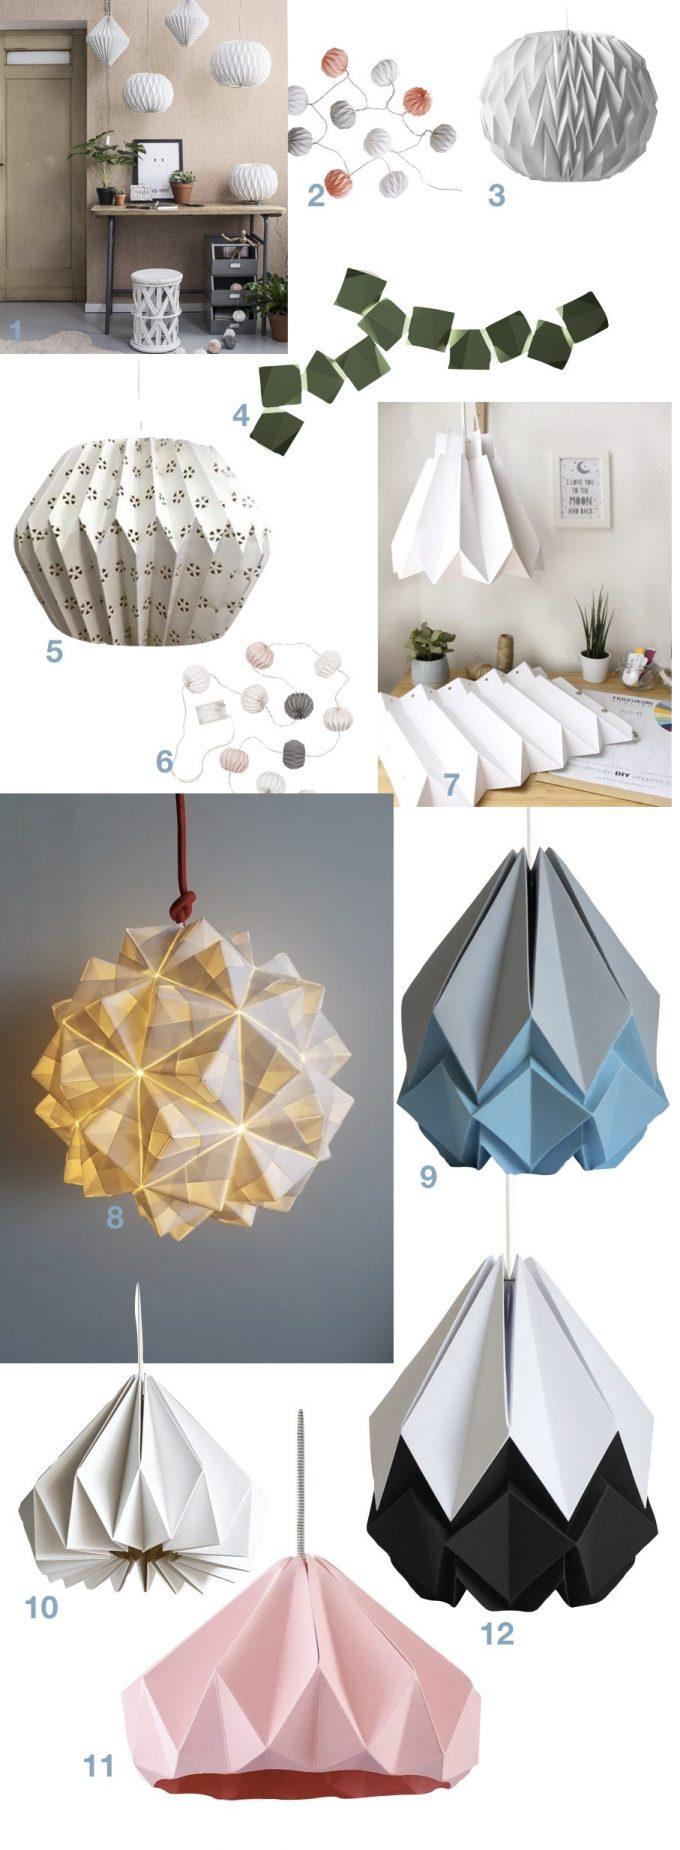 tuto lampe origami fait main diy blog deco clemaroundthecorner.001